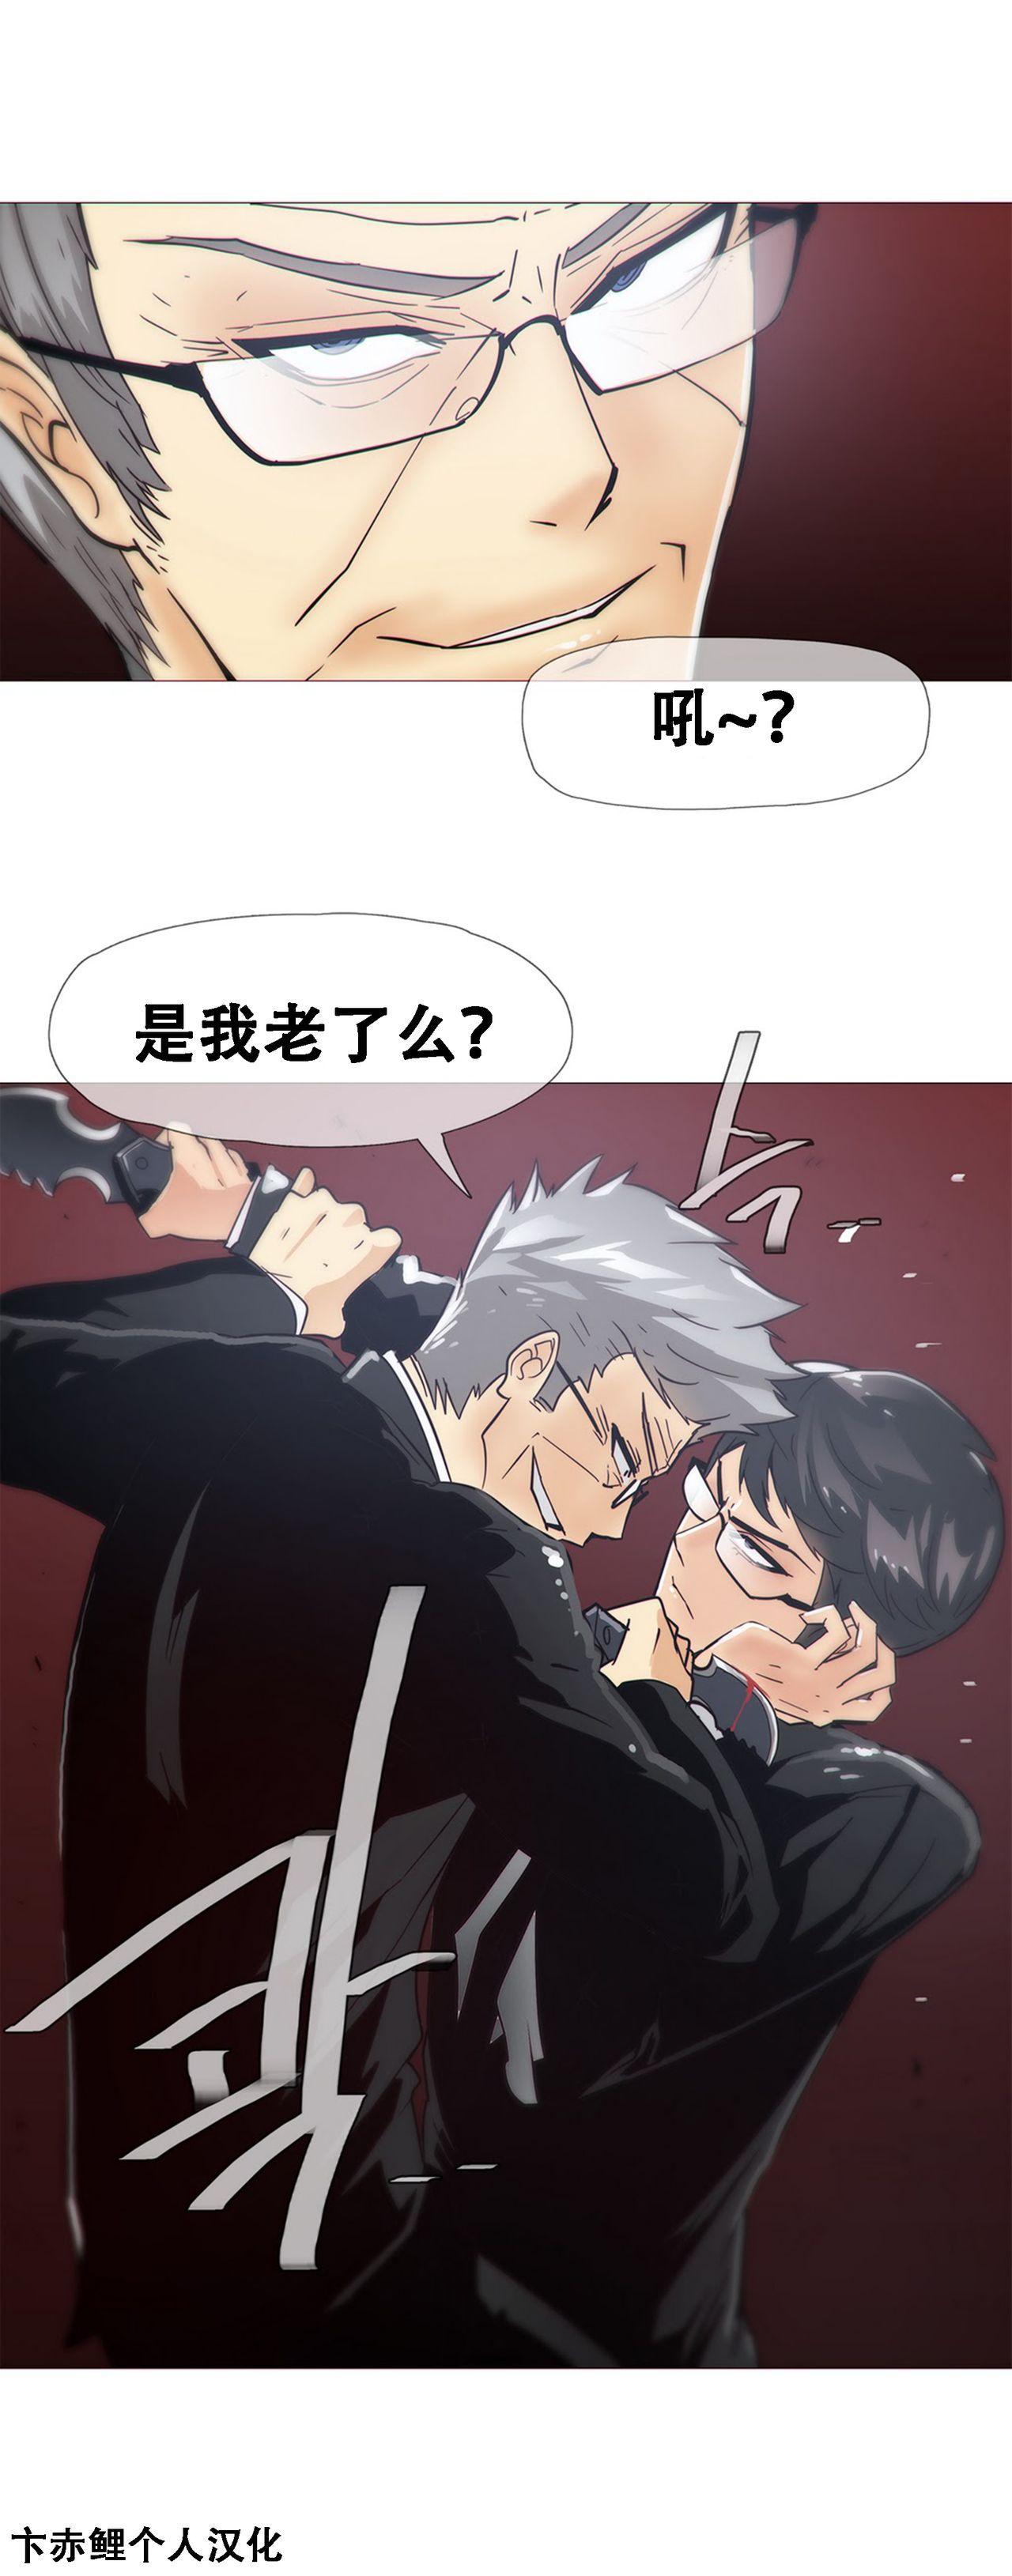 HouseHold Affairs 【卞赤鲤个人汉化】1~33话(持续更新中) 356